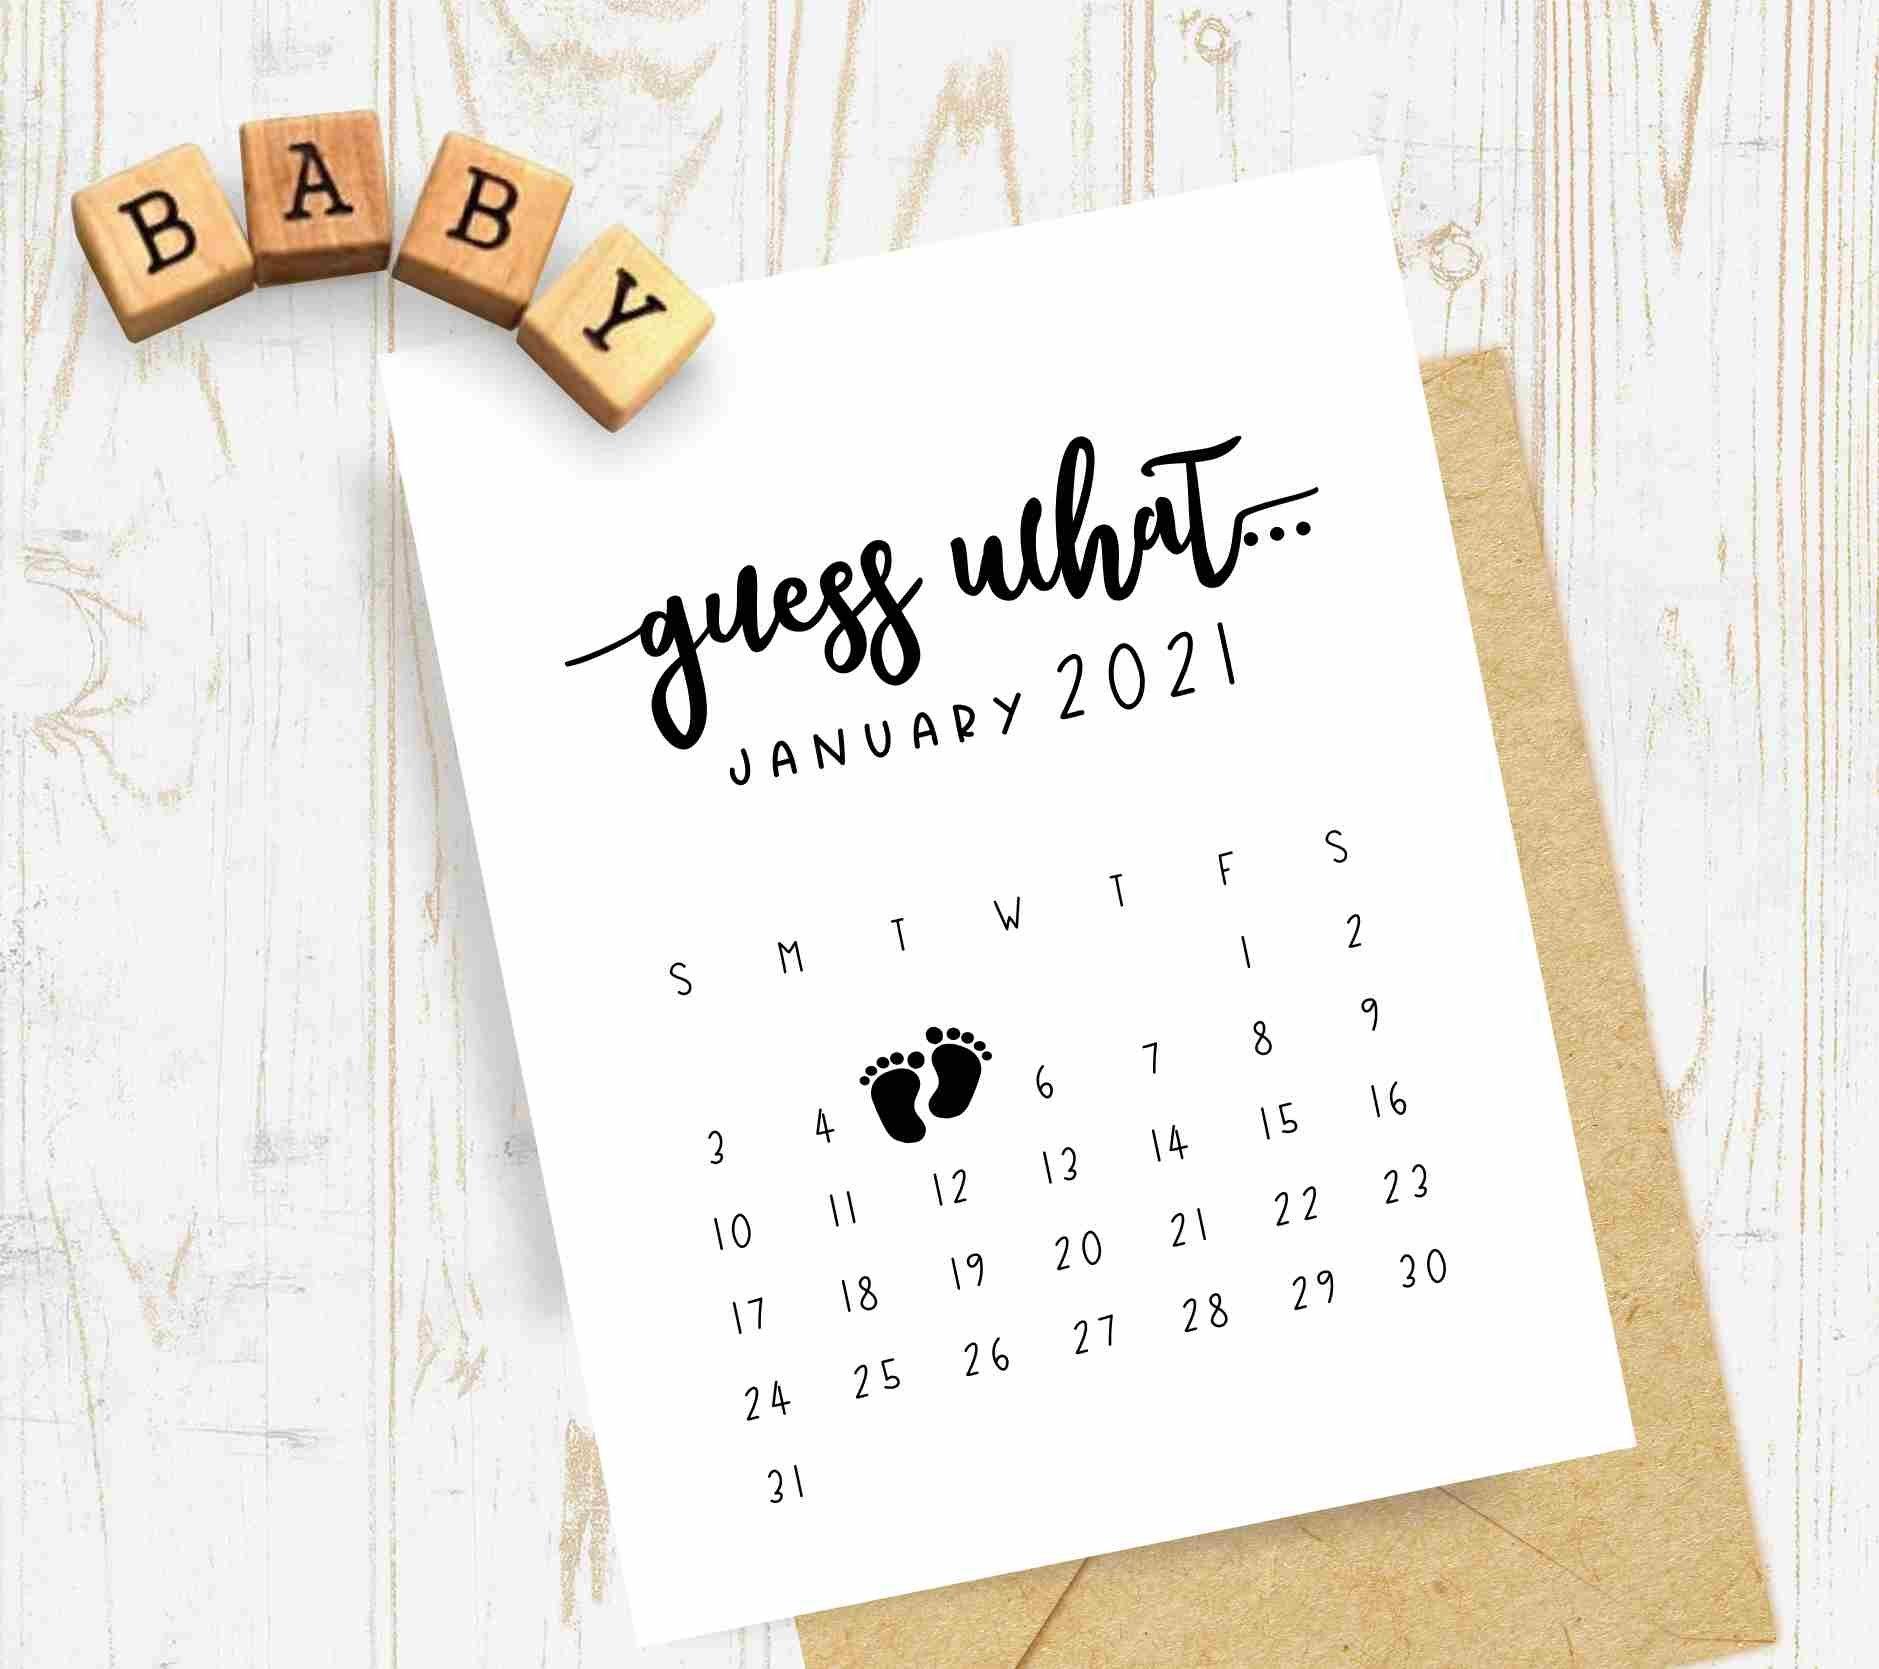 Pregnancy Announcement Calendar – Personalized Guess What Calendar Guess The Due Date Printable Calendar